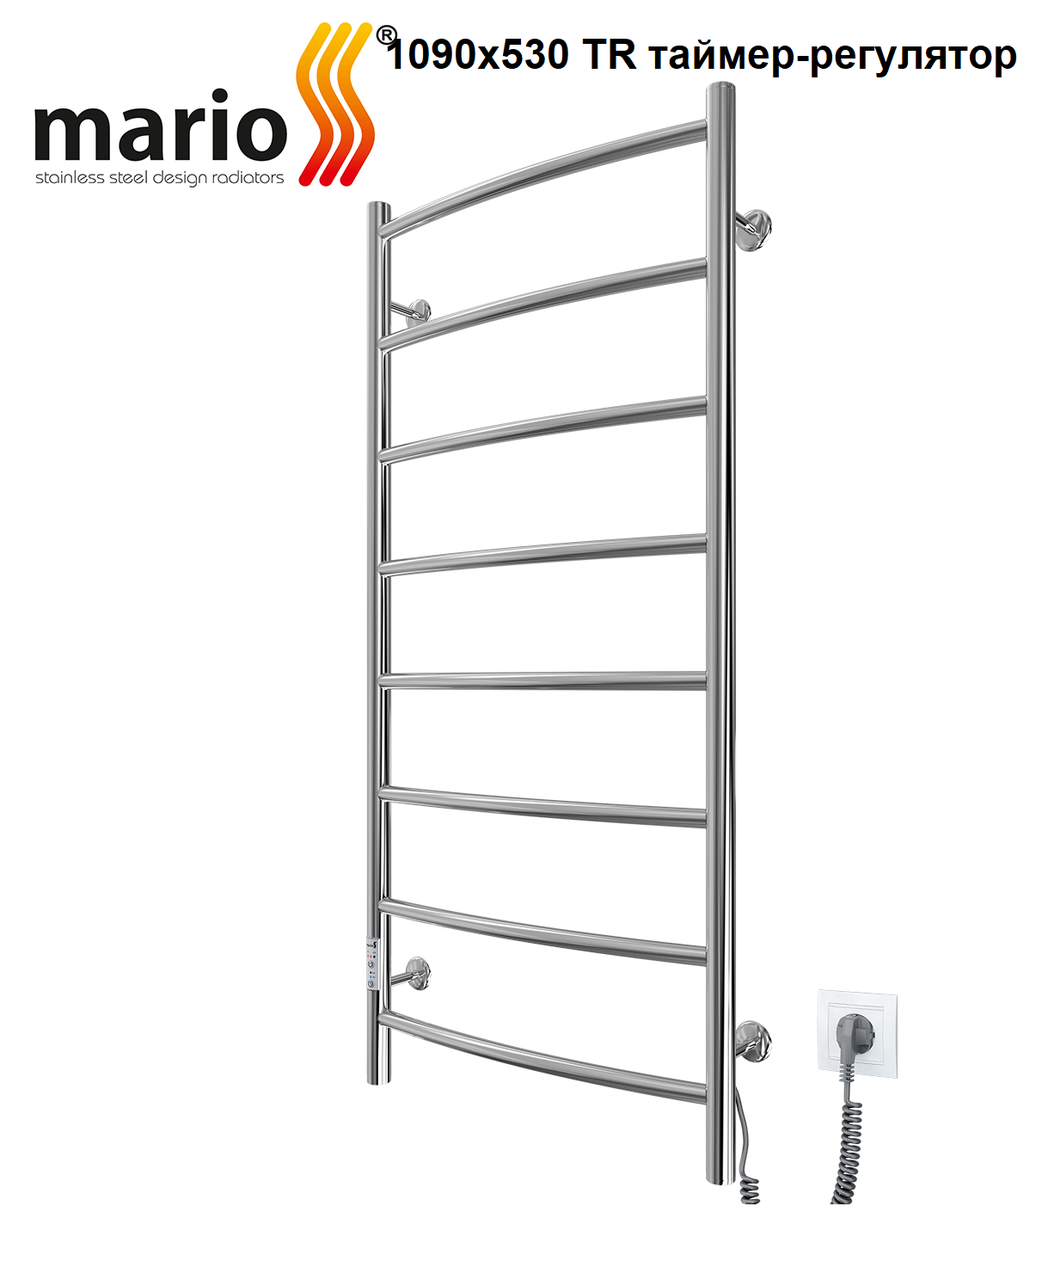 Полотенцесушитель Mario Класик HP -I 1090x530 TR